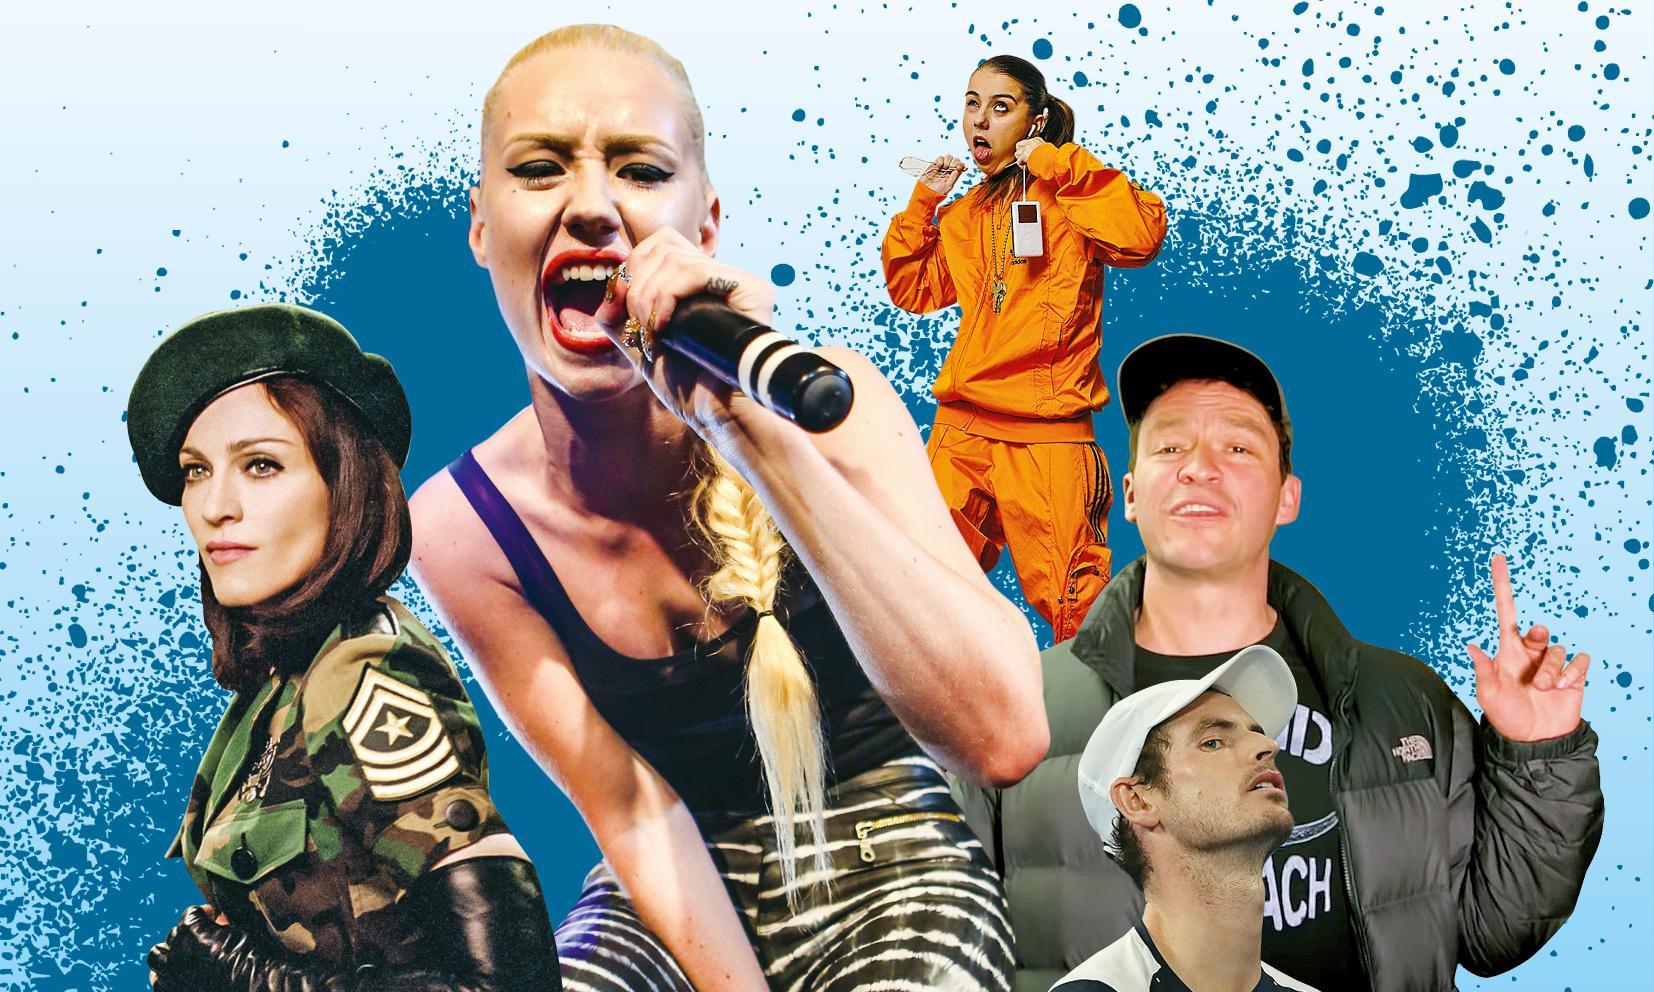 21st century's worst raps